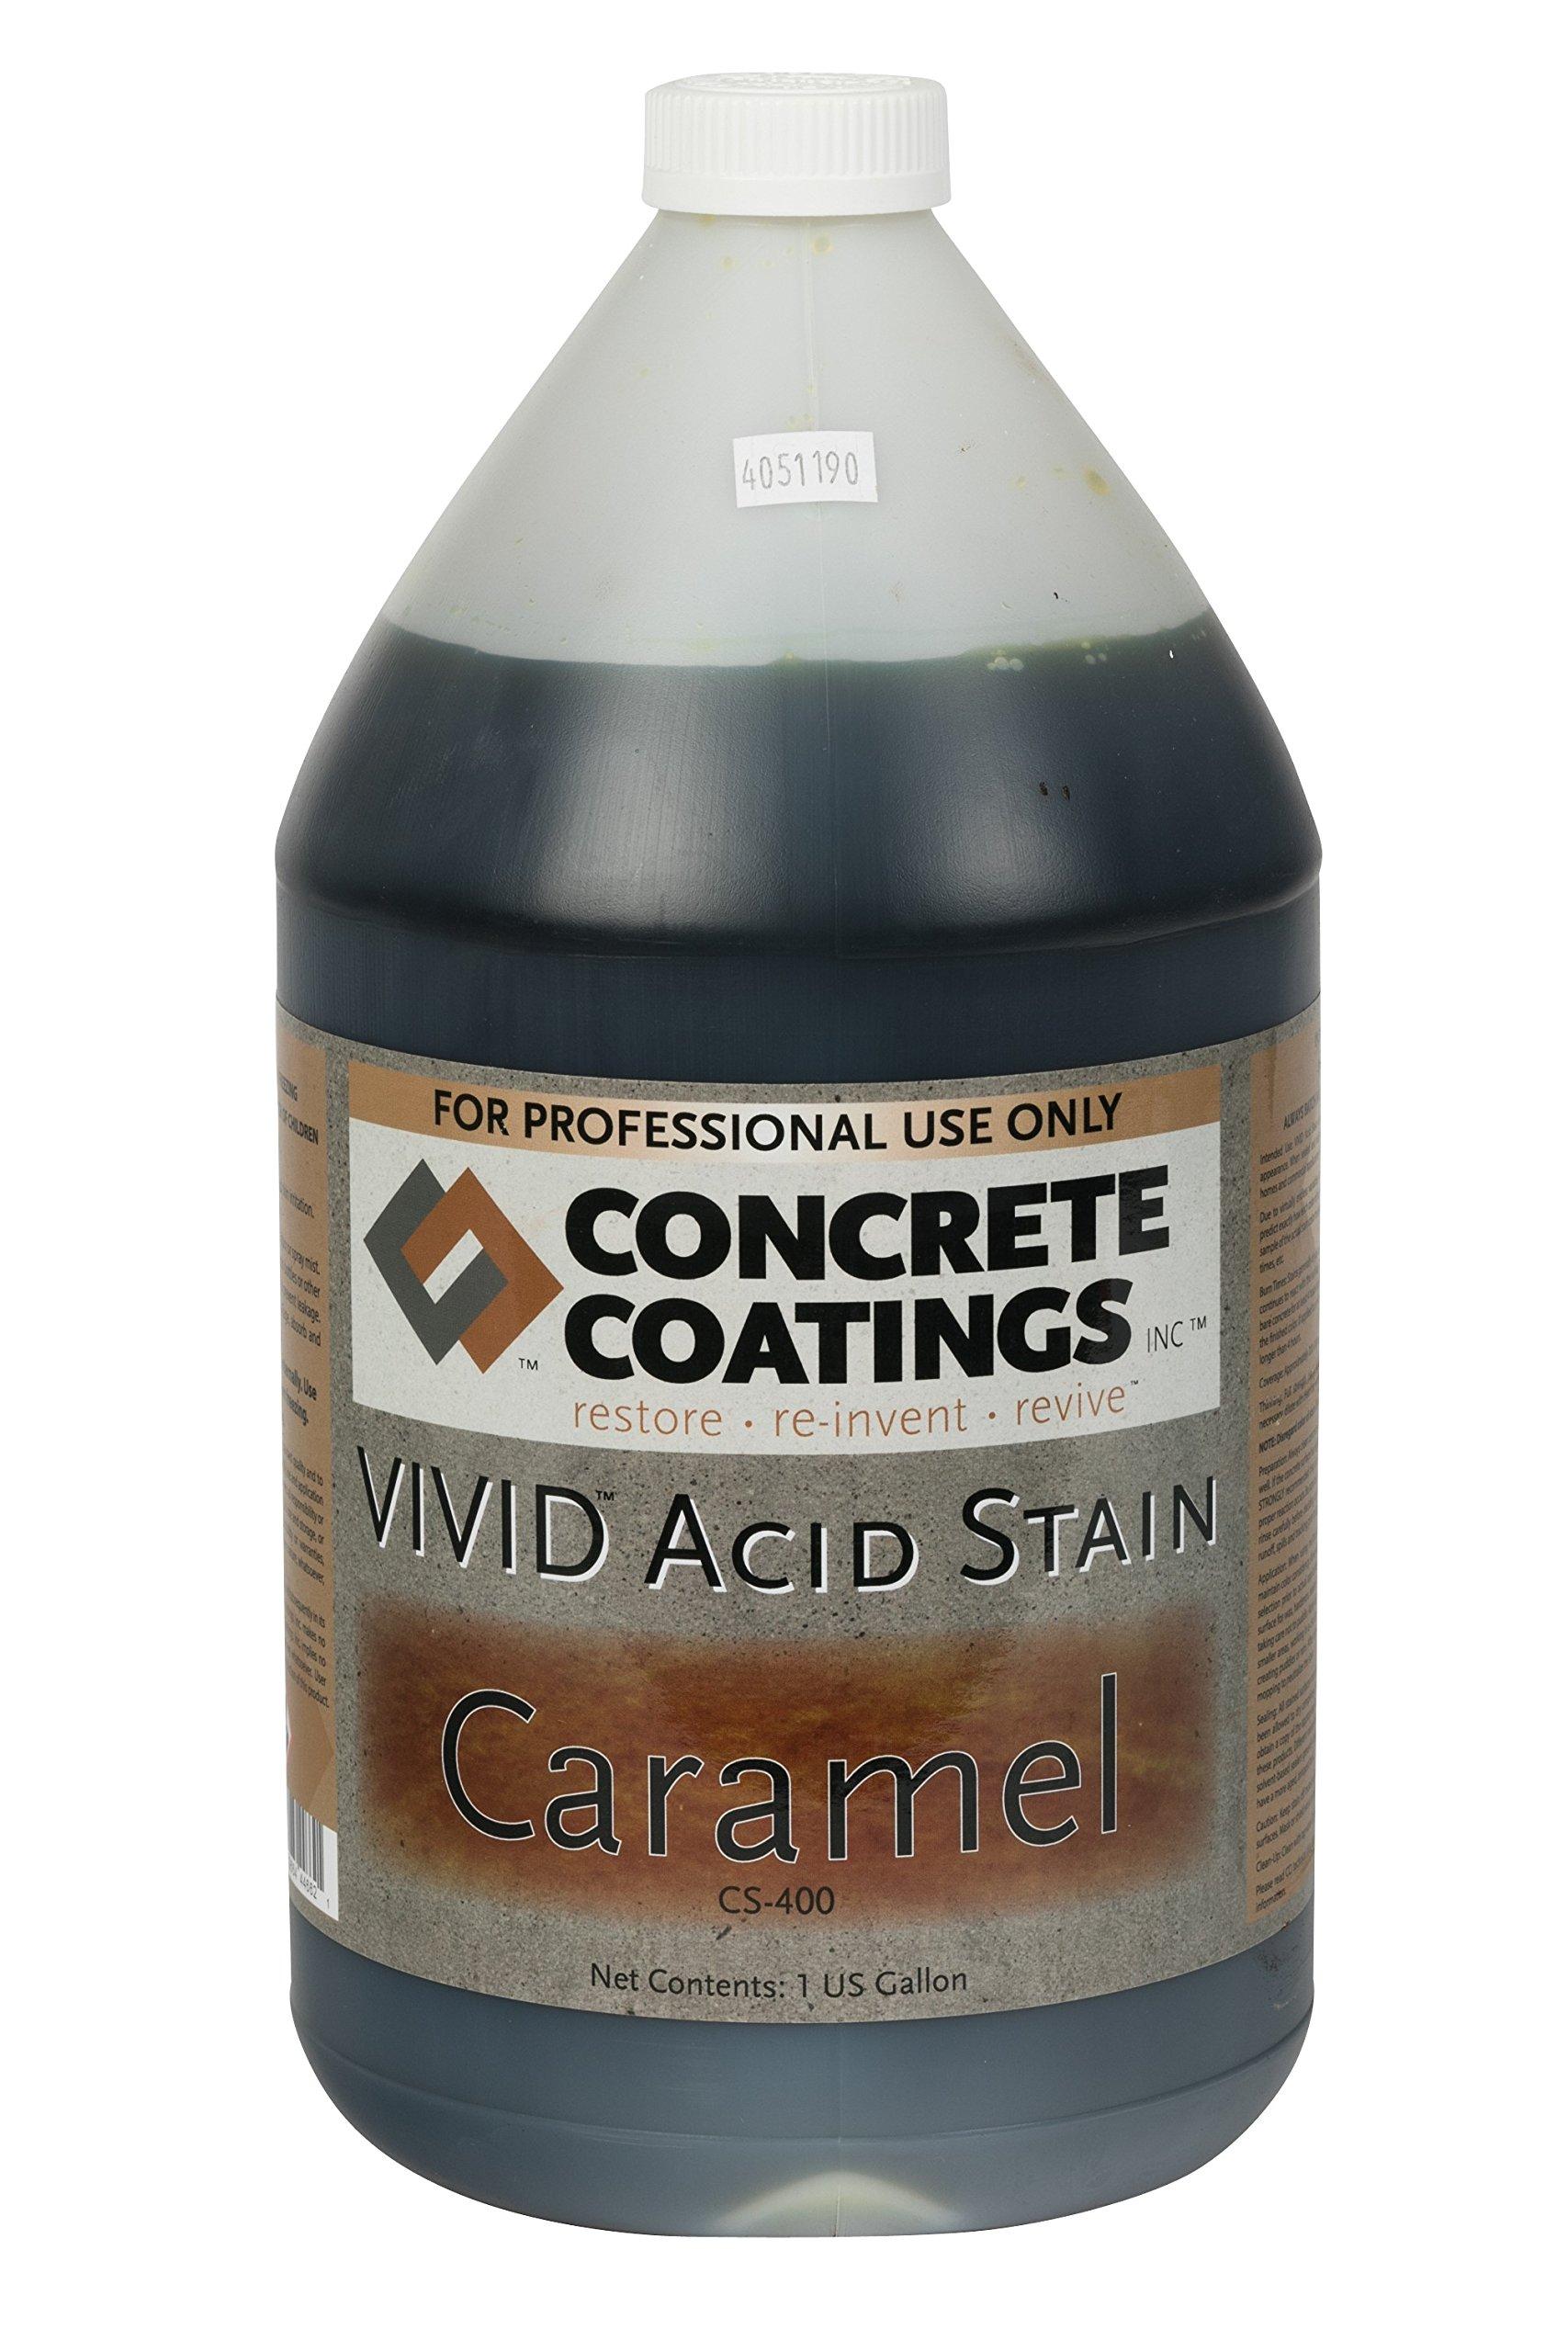 VIVID Acid Stain - 1 Gal - Caramel (Light, Yellowish Brown)